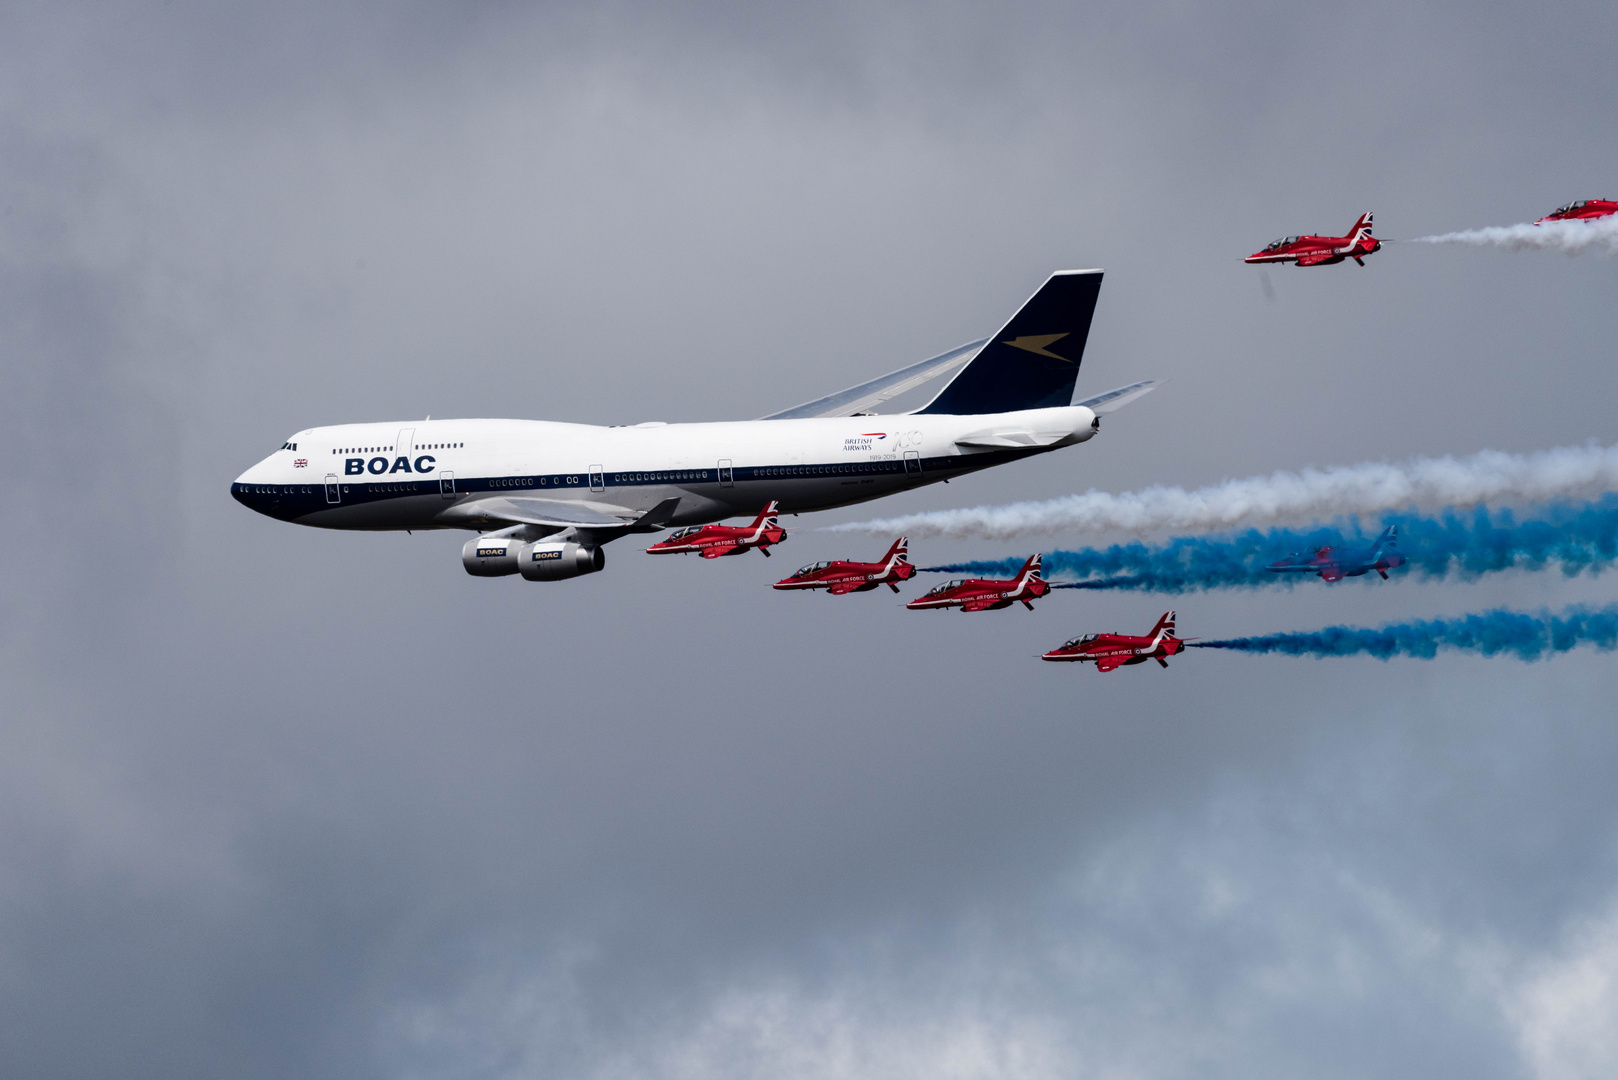 RED ARROWS BOAC 747